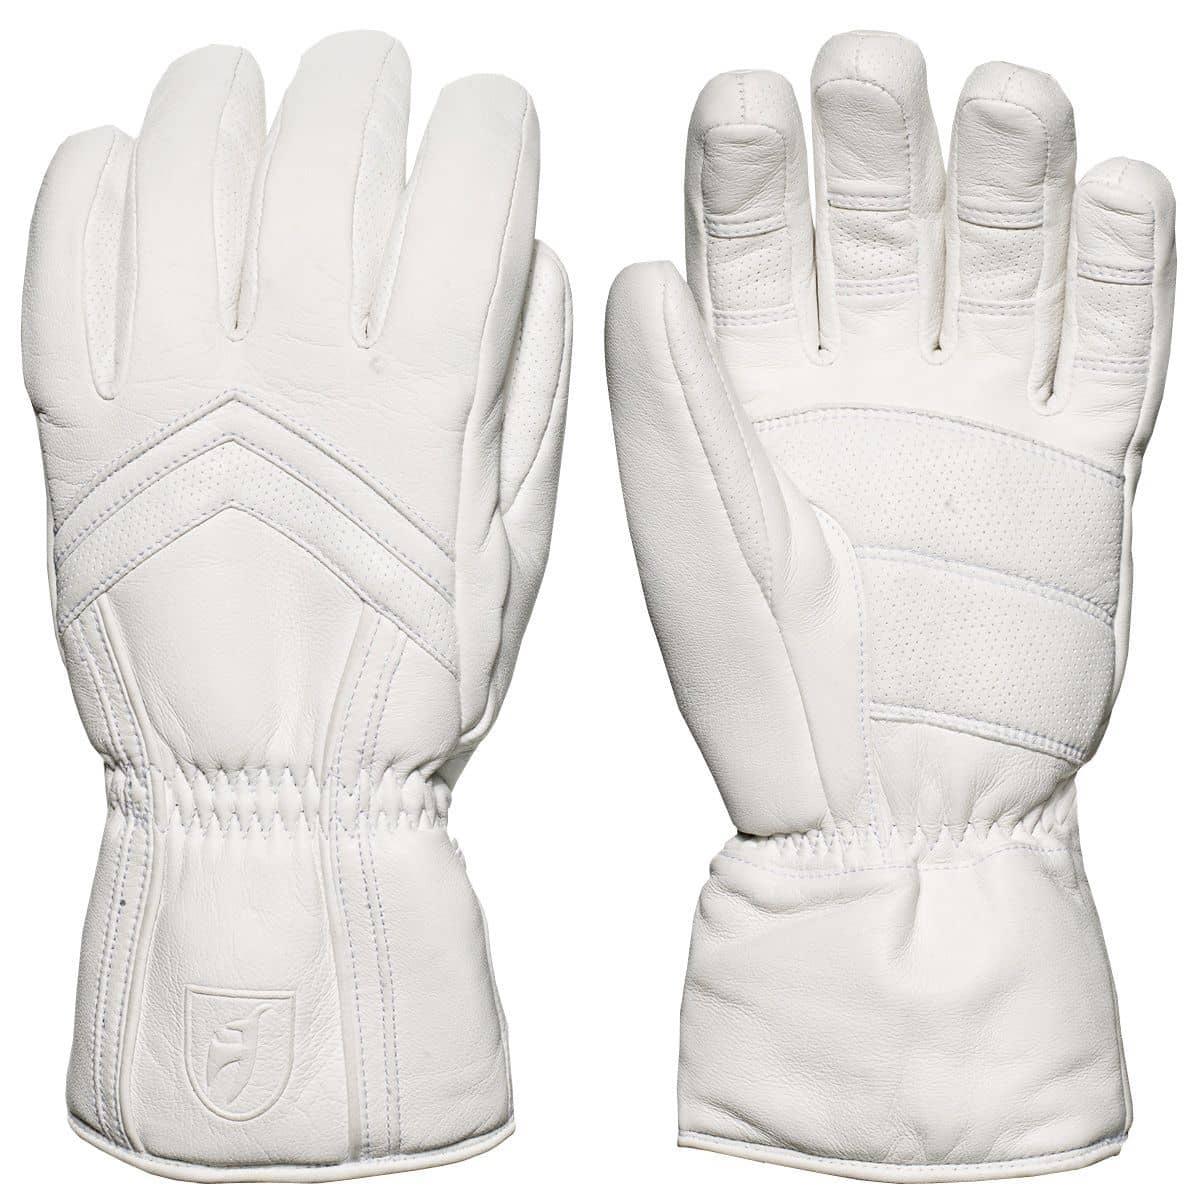 Toni Sailer Leyla Glove bright white